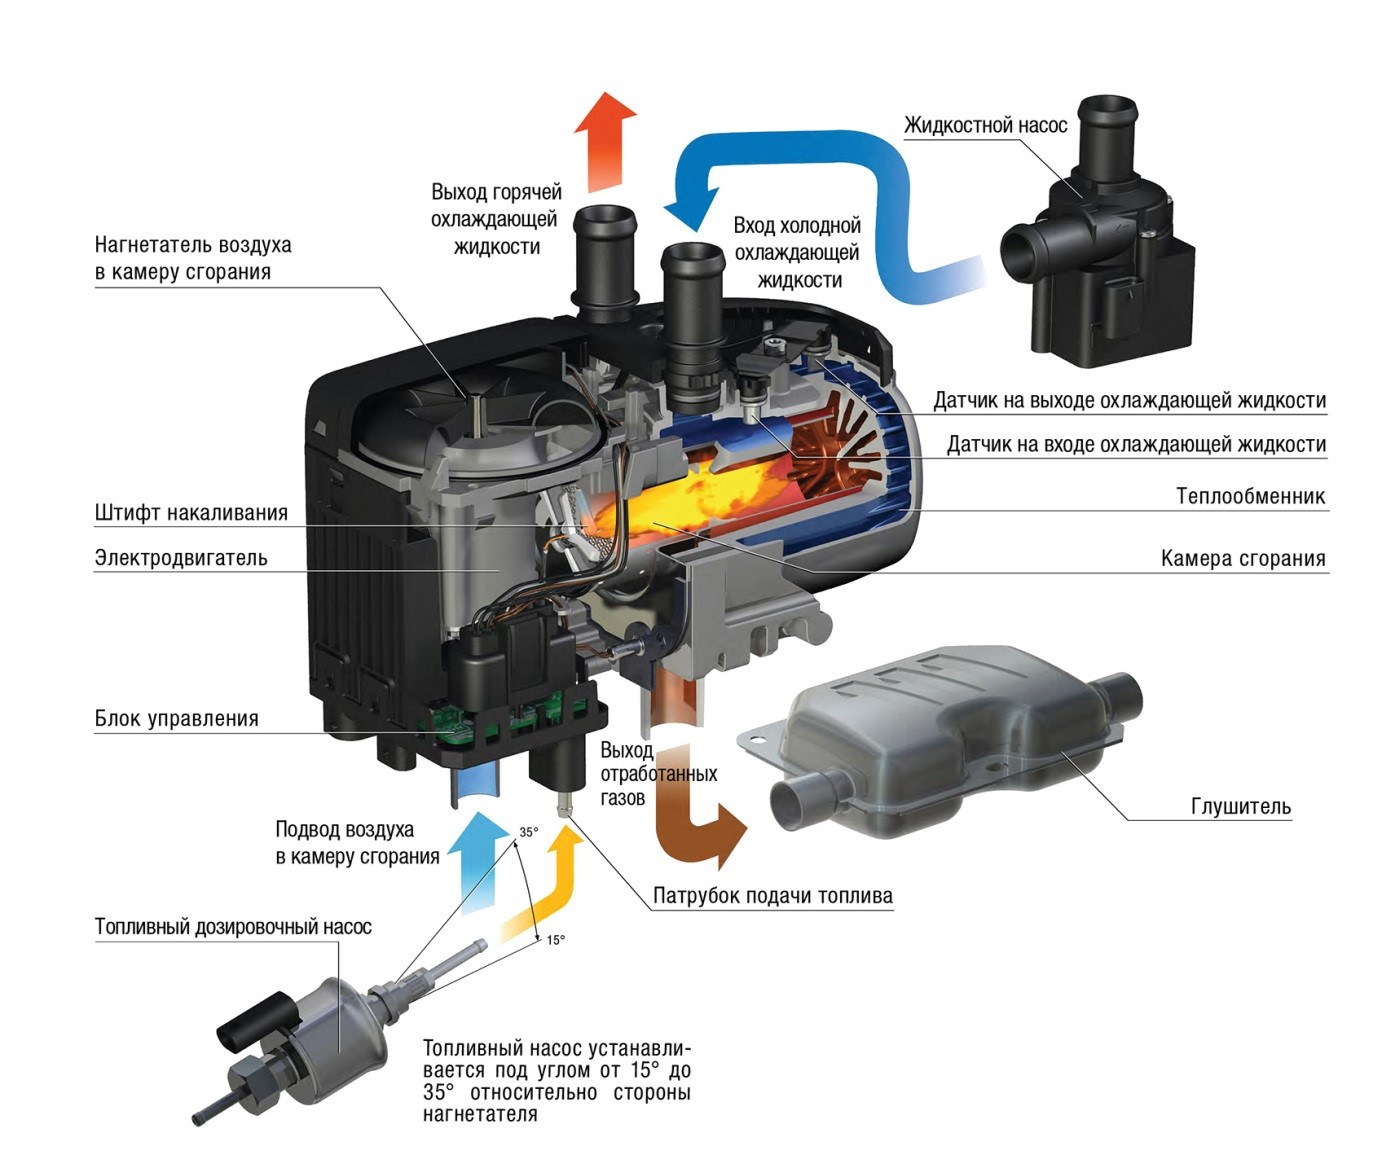 princip raboty hydronic